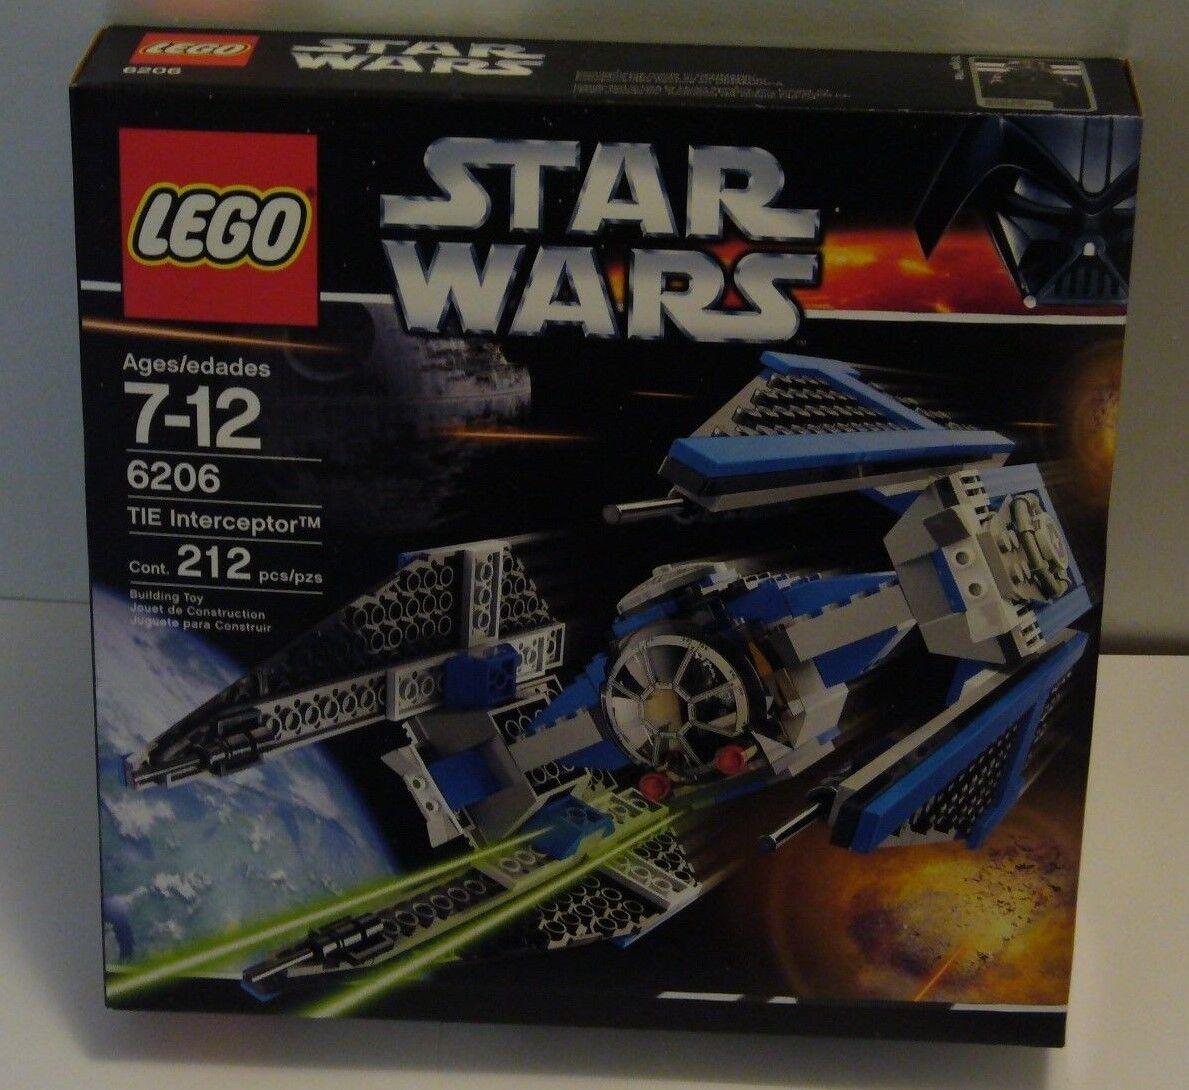 LEGO Star Wars Tie Interceptor Set 6206 Sealed Nuovo TIE Pilot Minifig